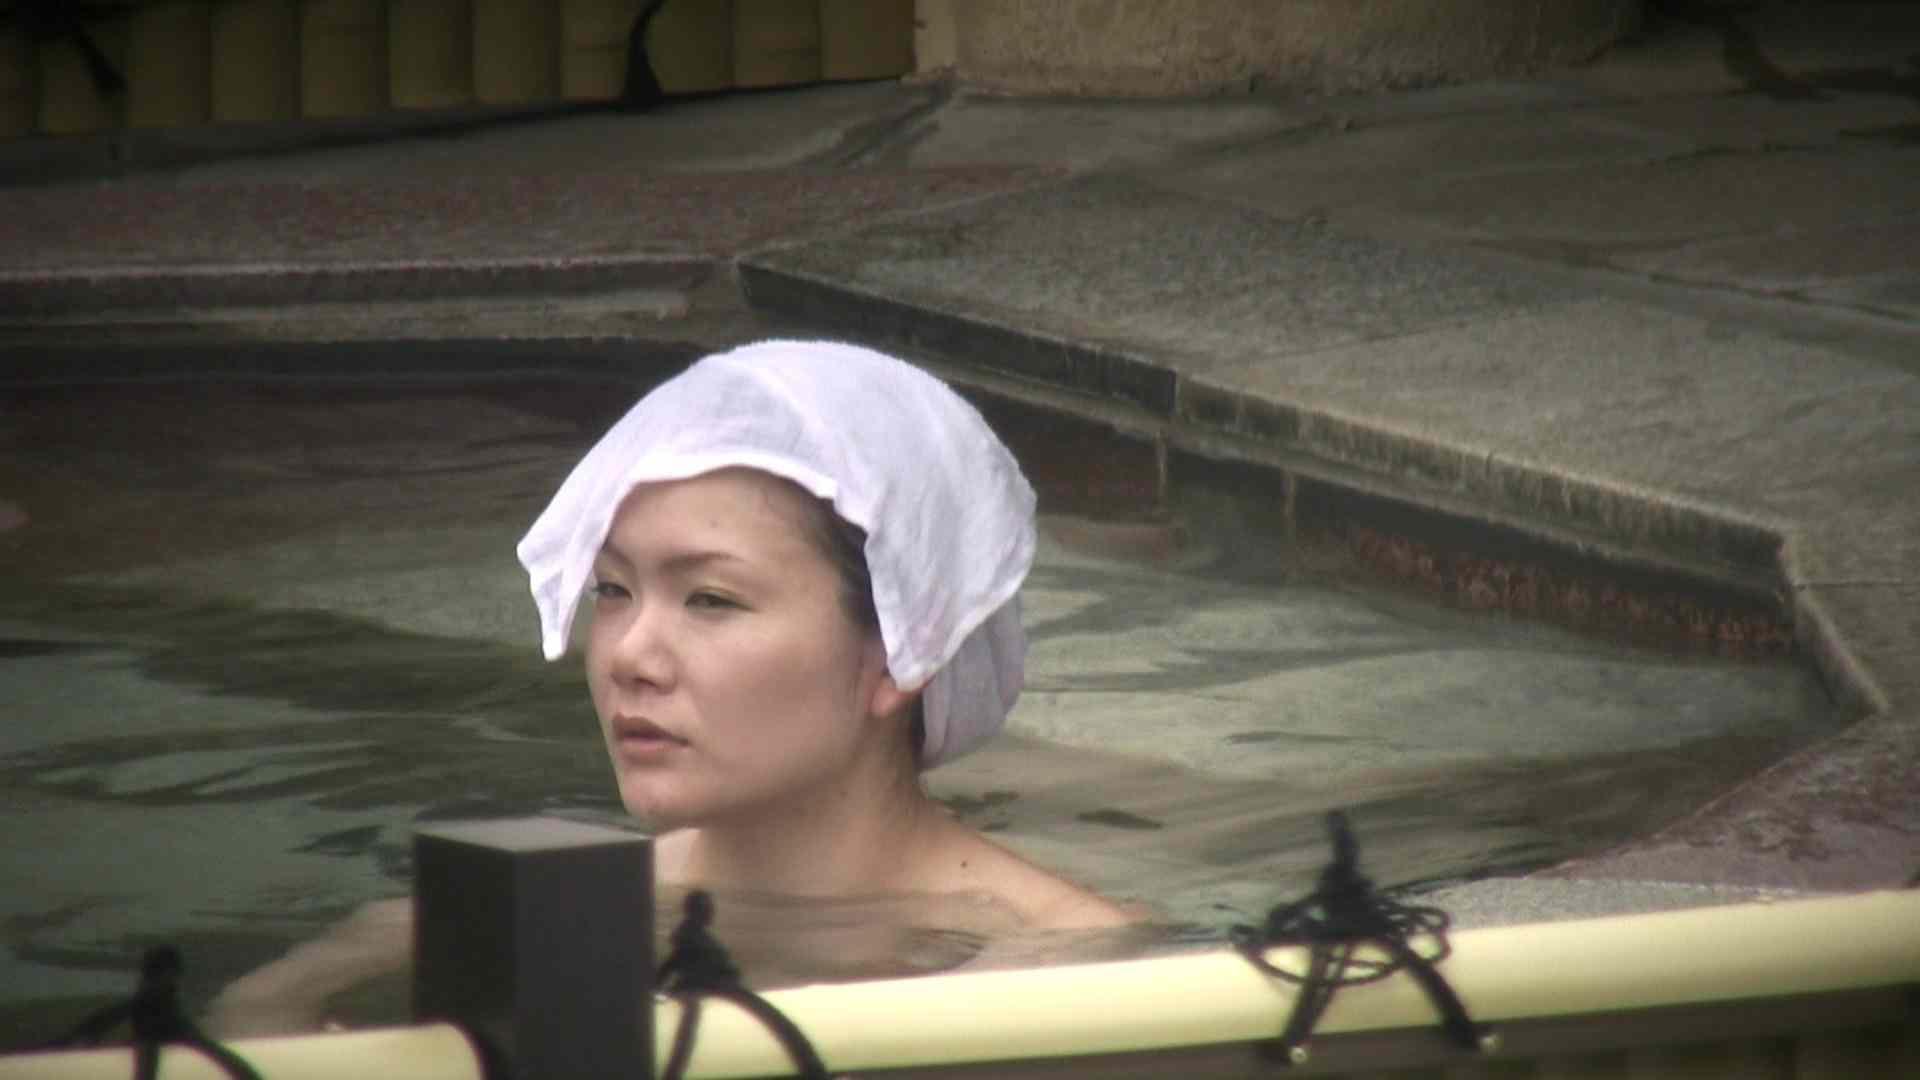 Aquaな露天風呂Vol.12【VIP】 HなOL | 盗撮  83pic 8